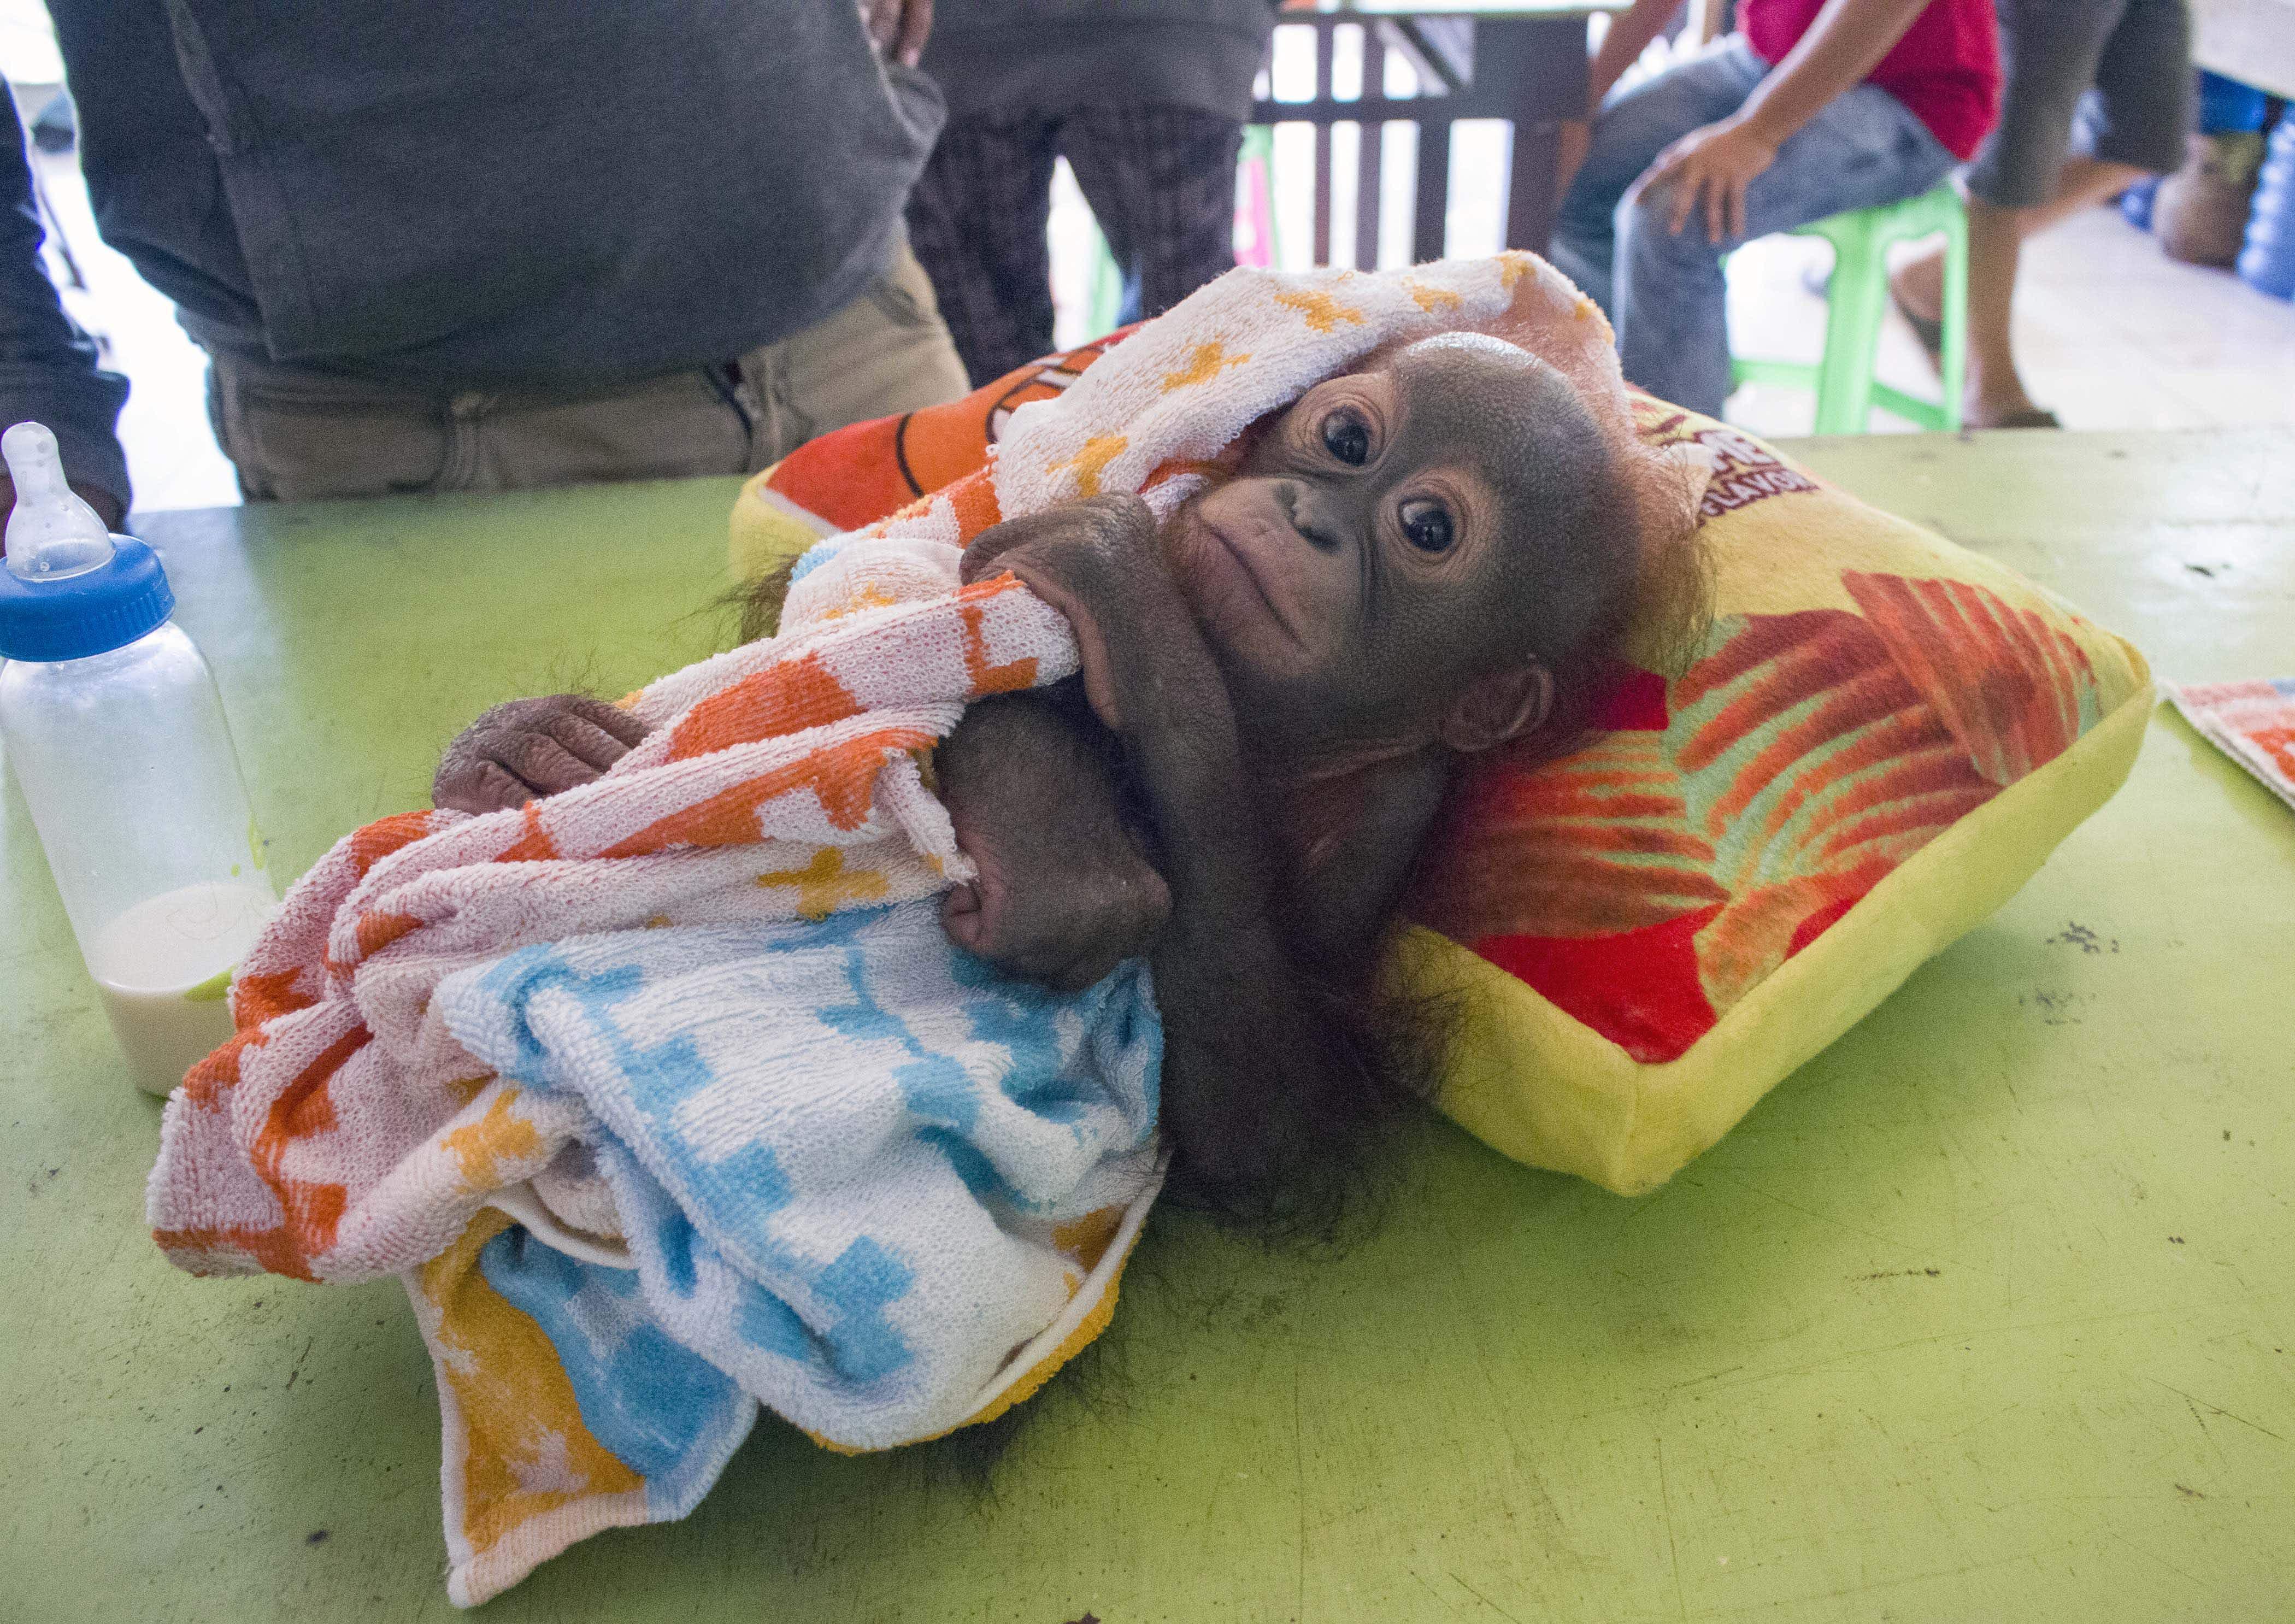 An adorable orphaned orangutan graduates from pre-school at a Borneo rescue centre